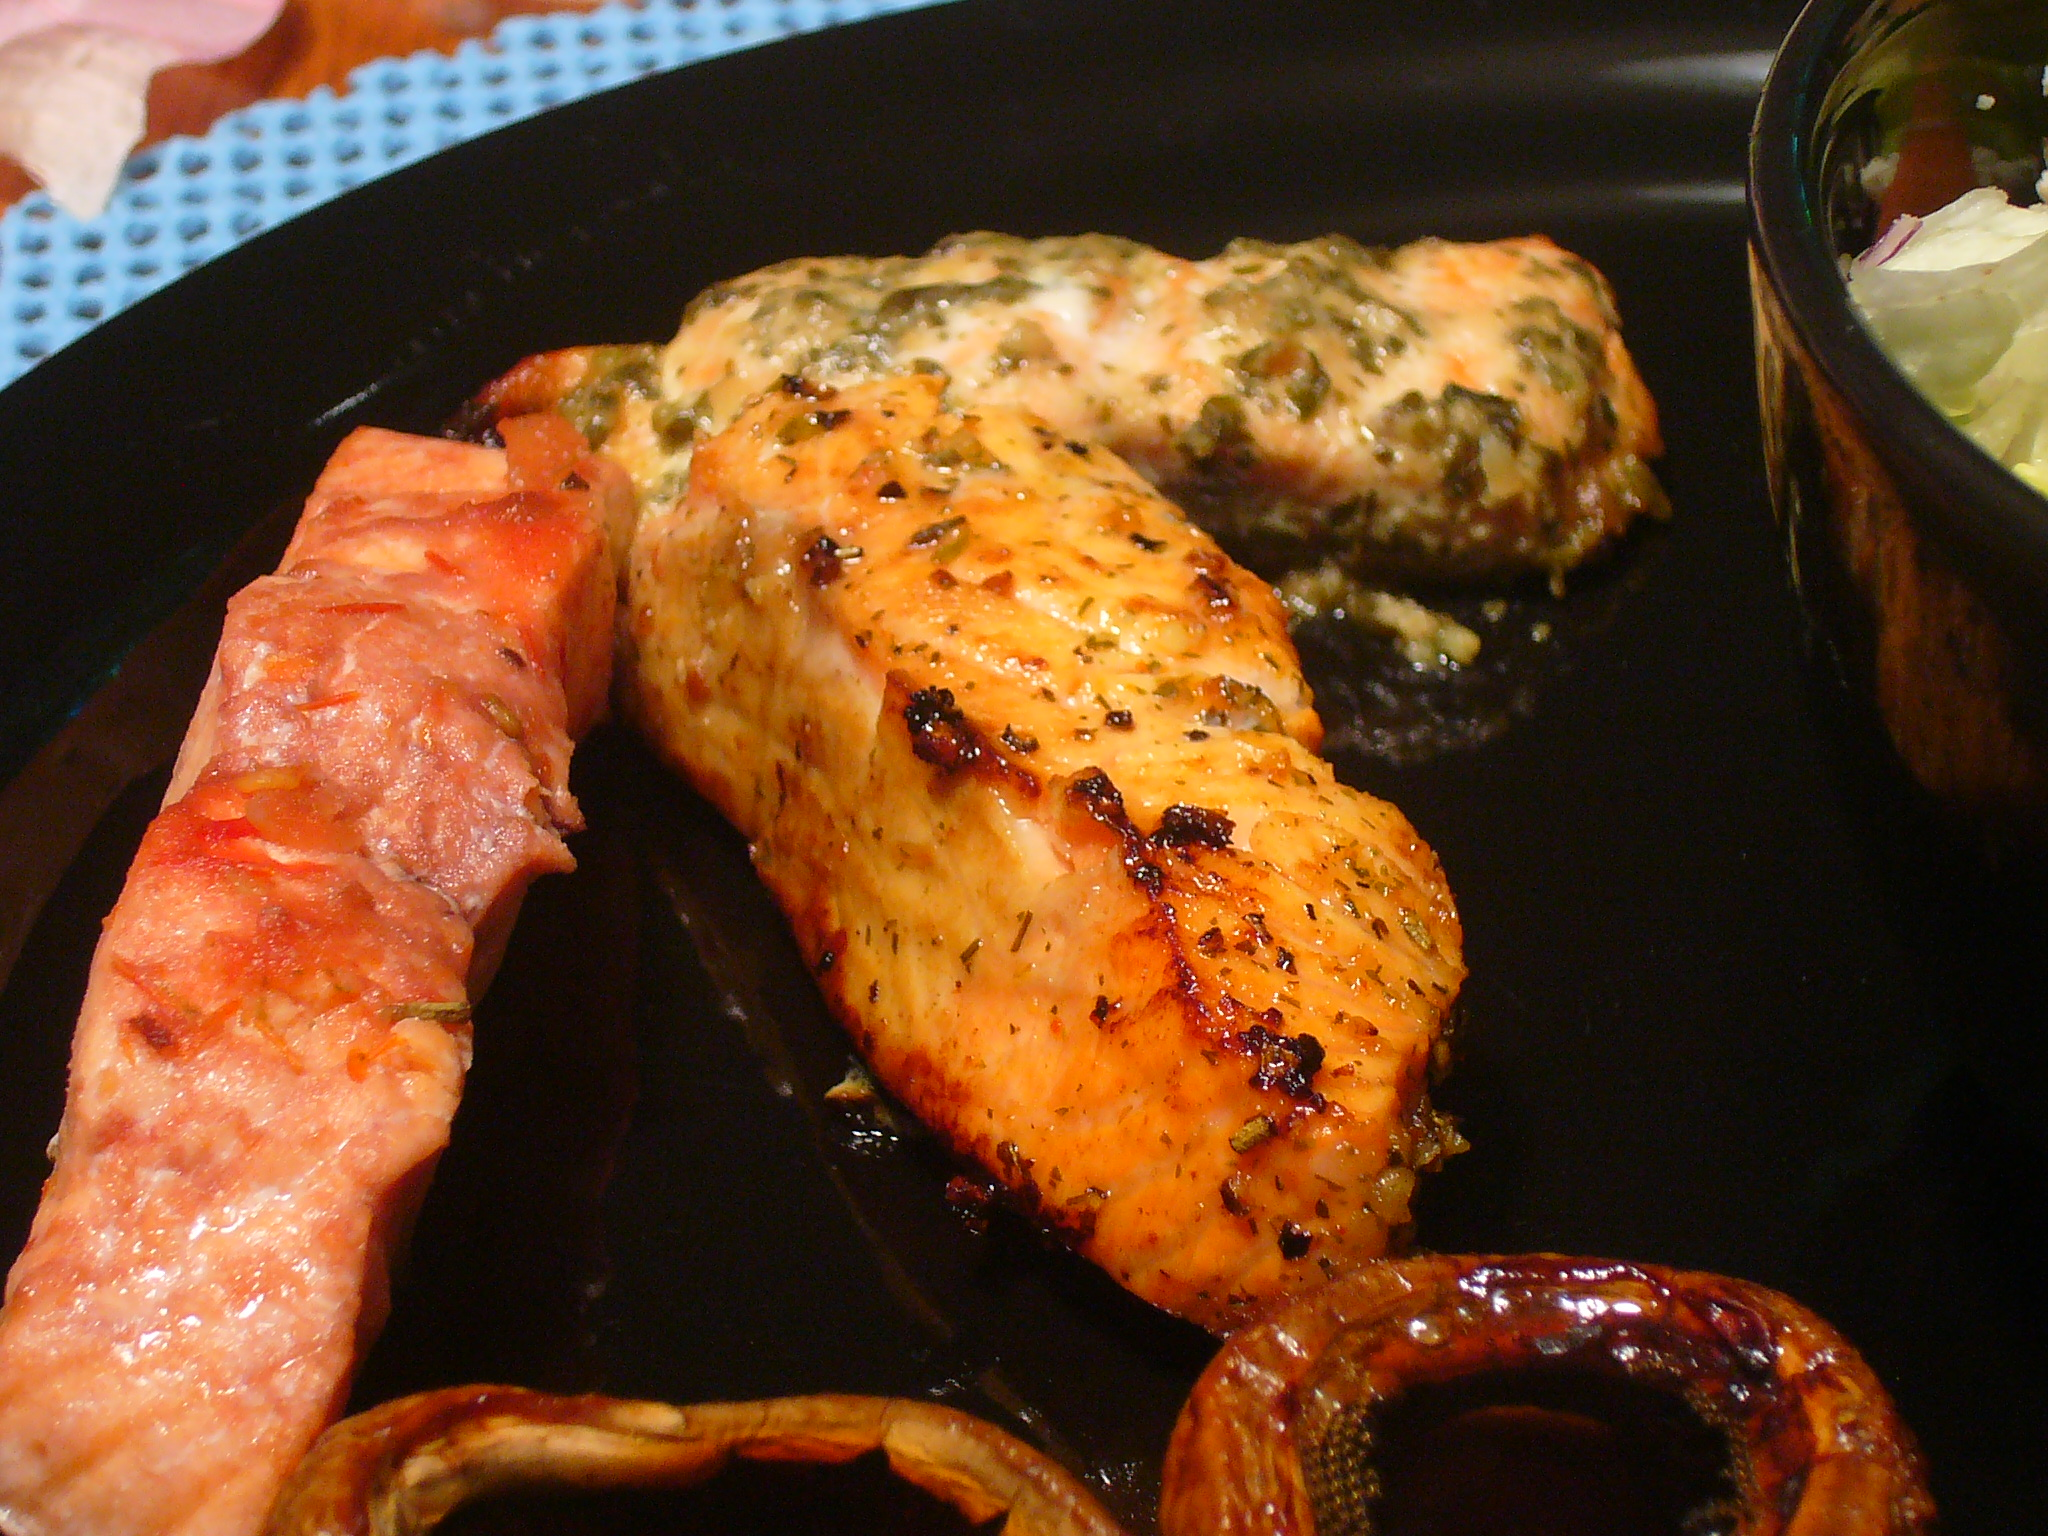 [Collegiate Meals] Three Way Salmon Steaks